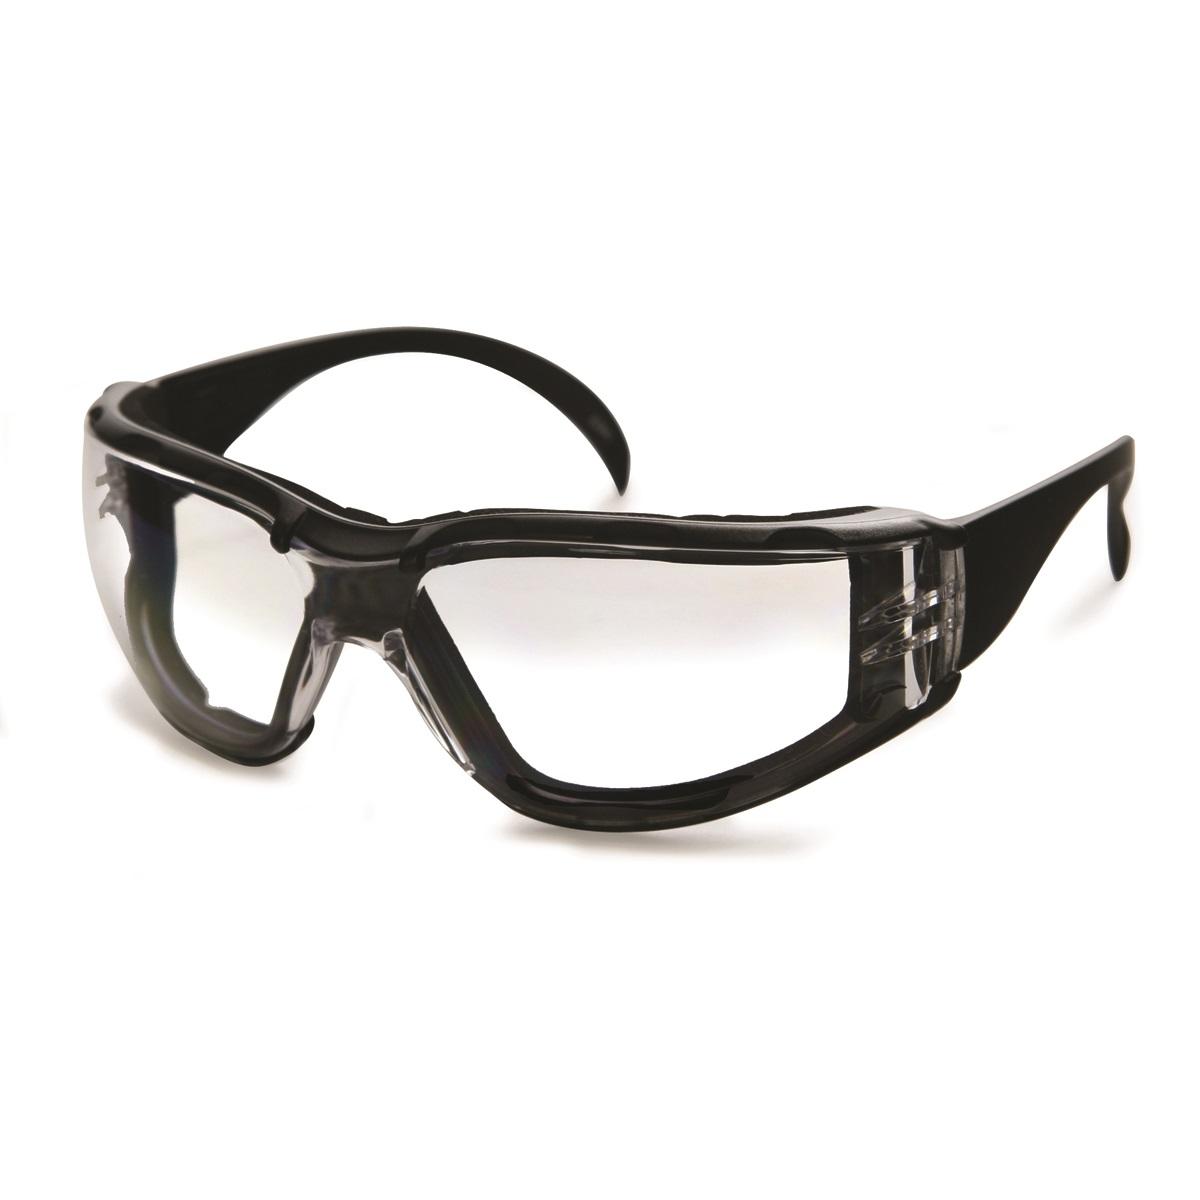 Eyeglass Frames In Kelowna : Clear AF lens with foam carrier - CSA NCA 76000